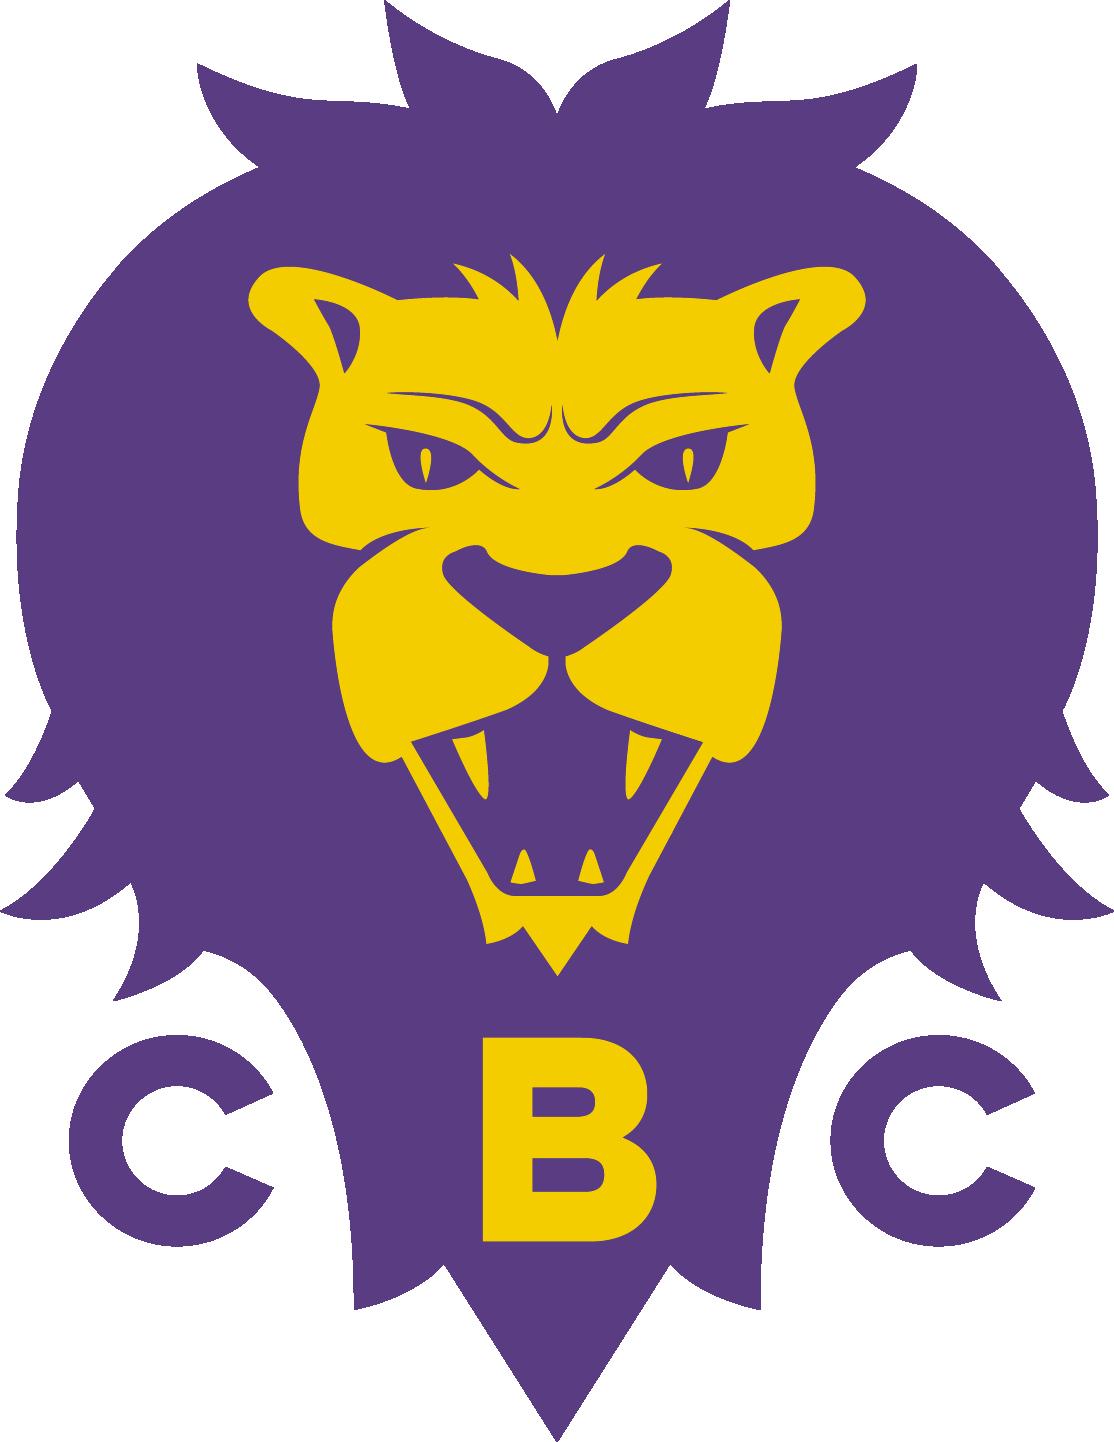 CBC-purplegoldlogo_NO-Carolina.png